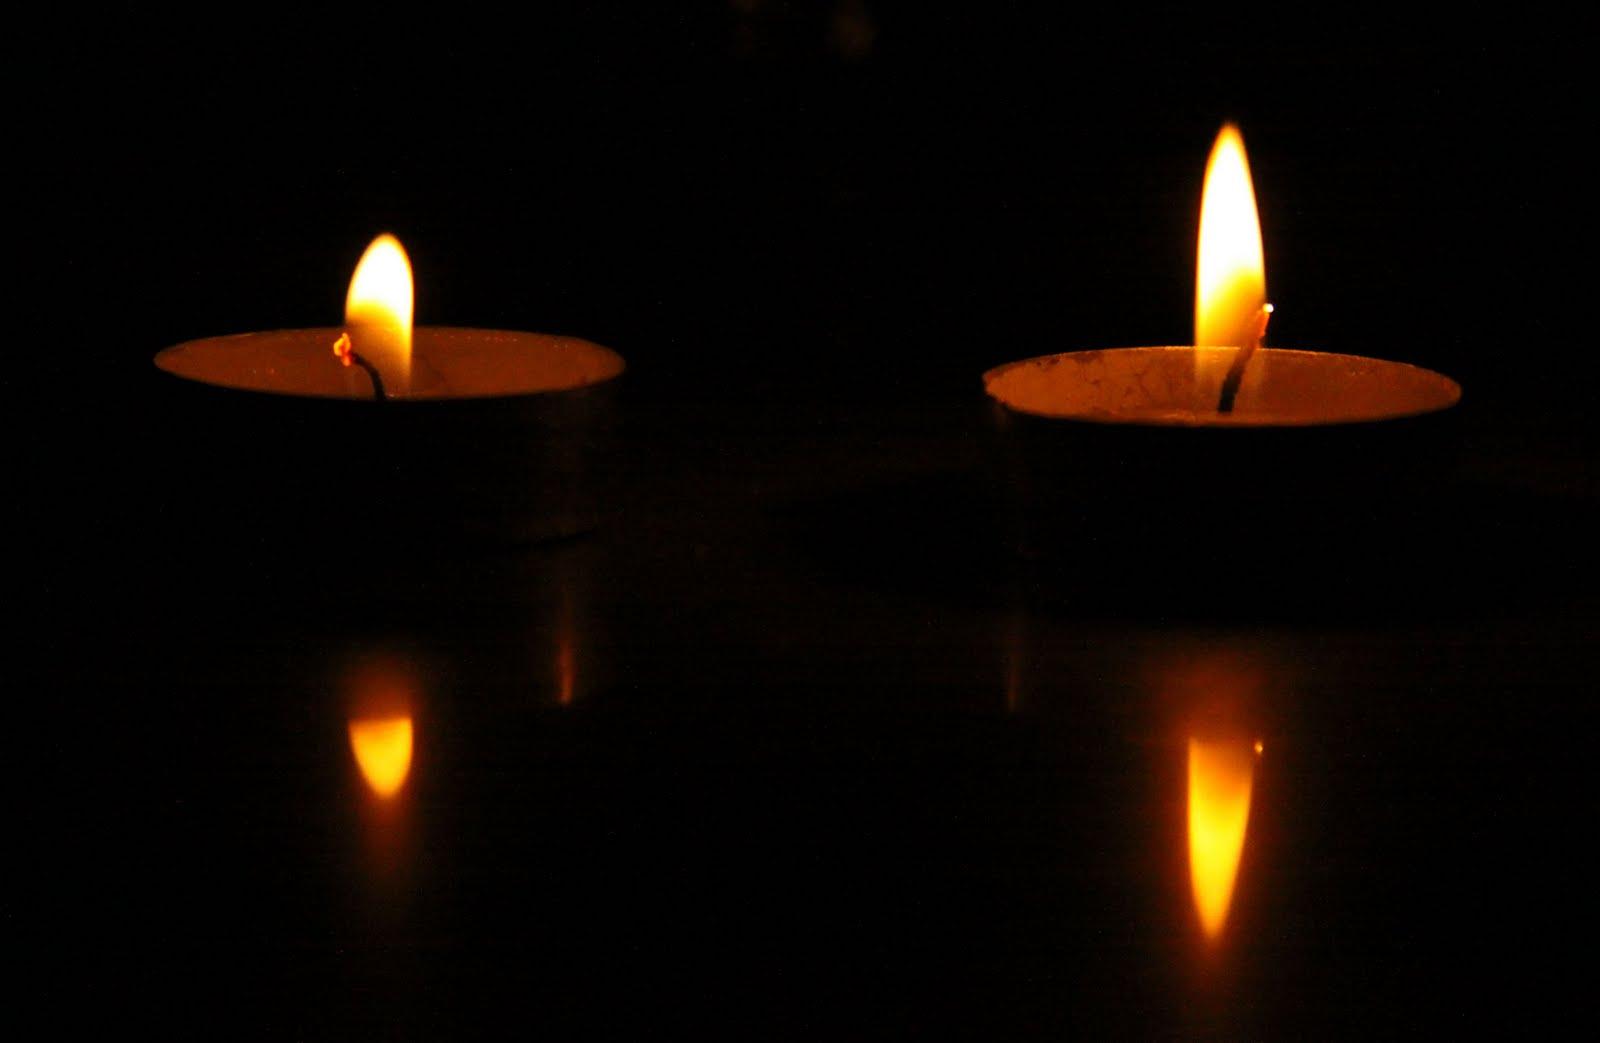 i spy with my mojalvo eye shabbat candles